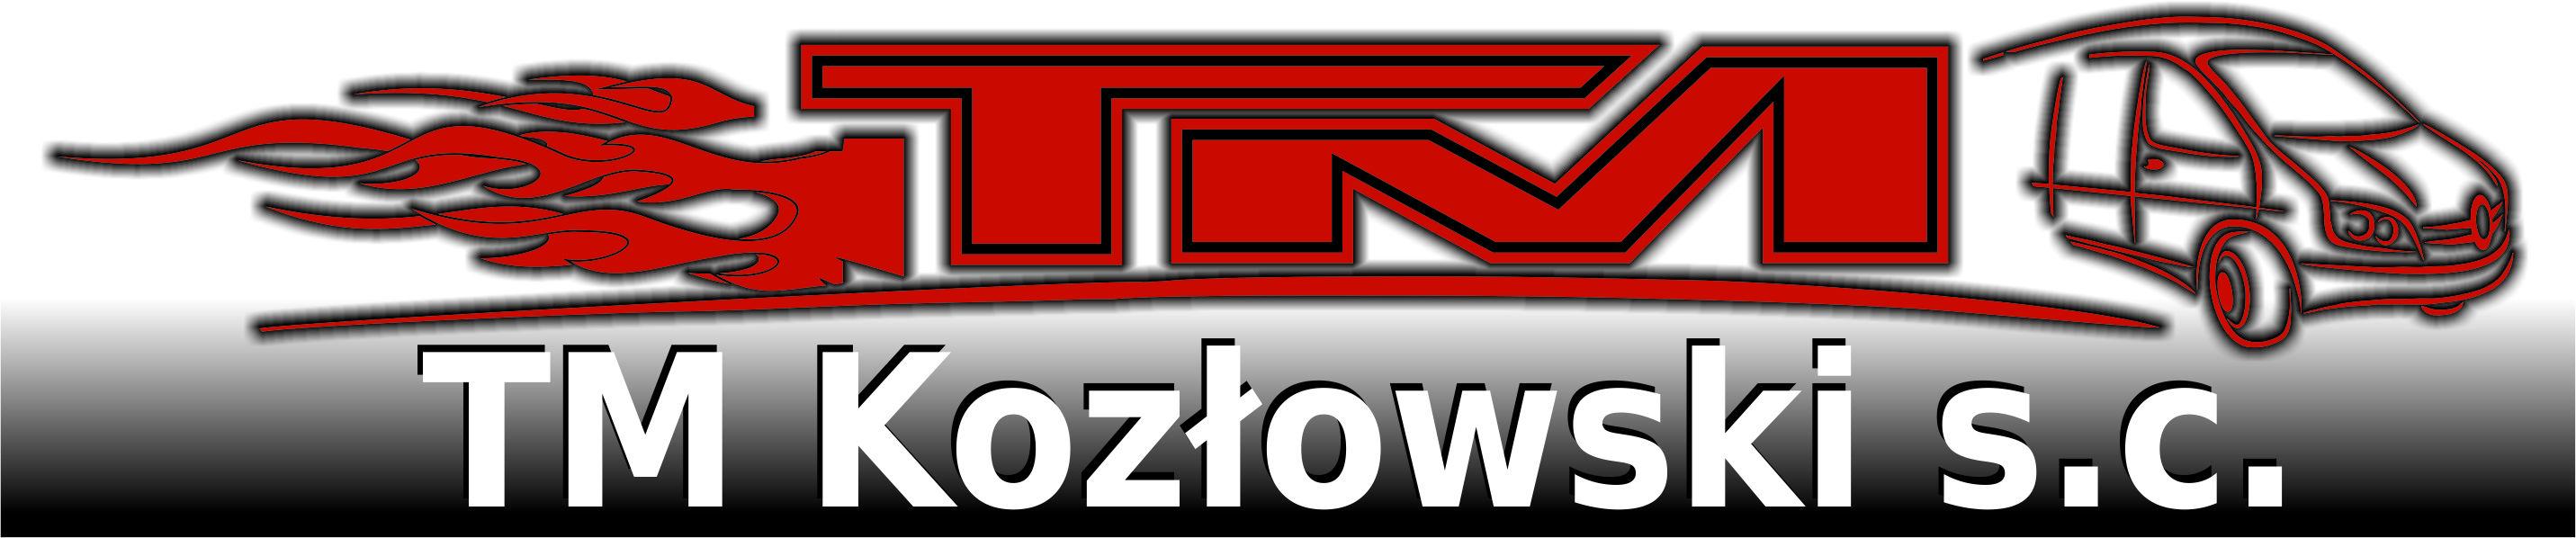 Logo TM Kozłowski s.c.